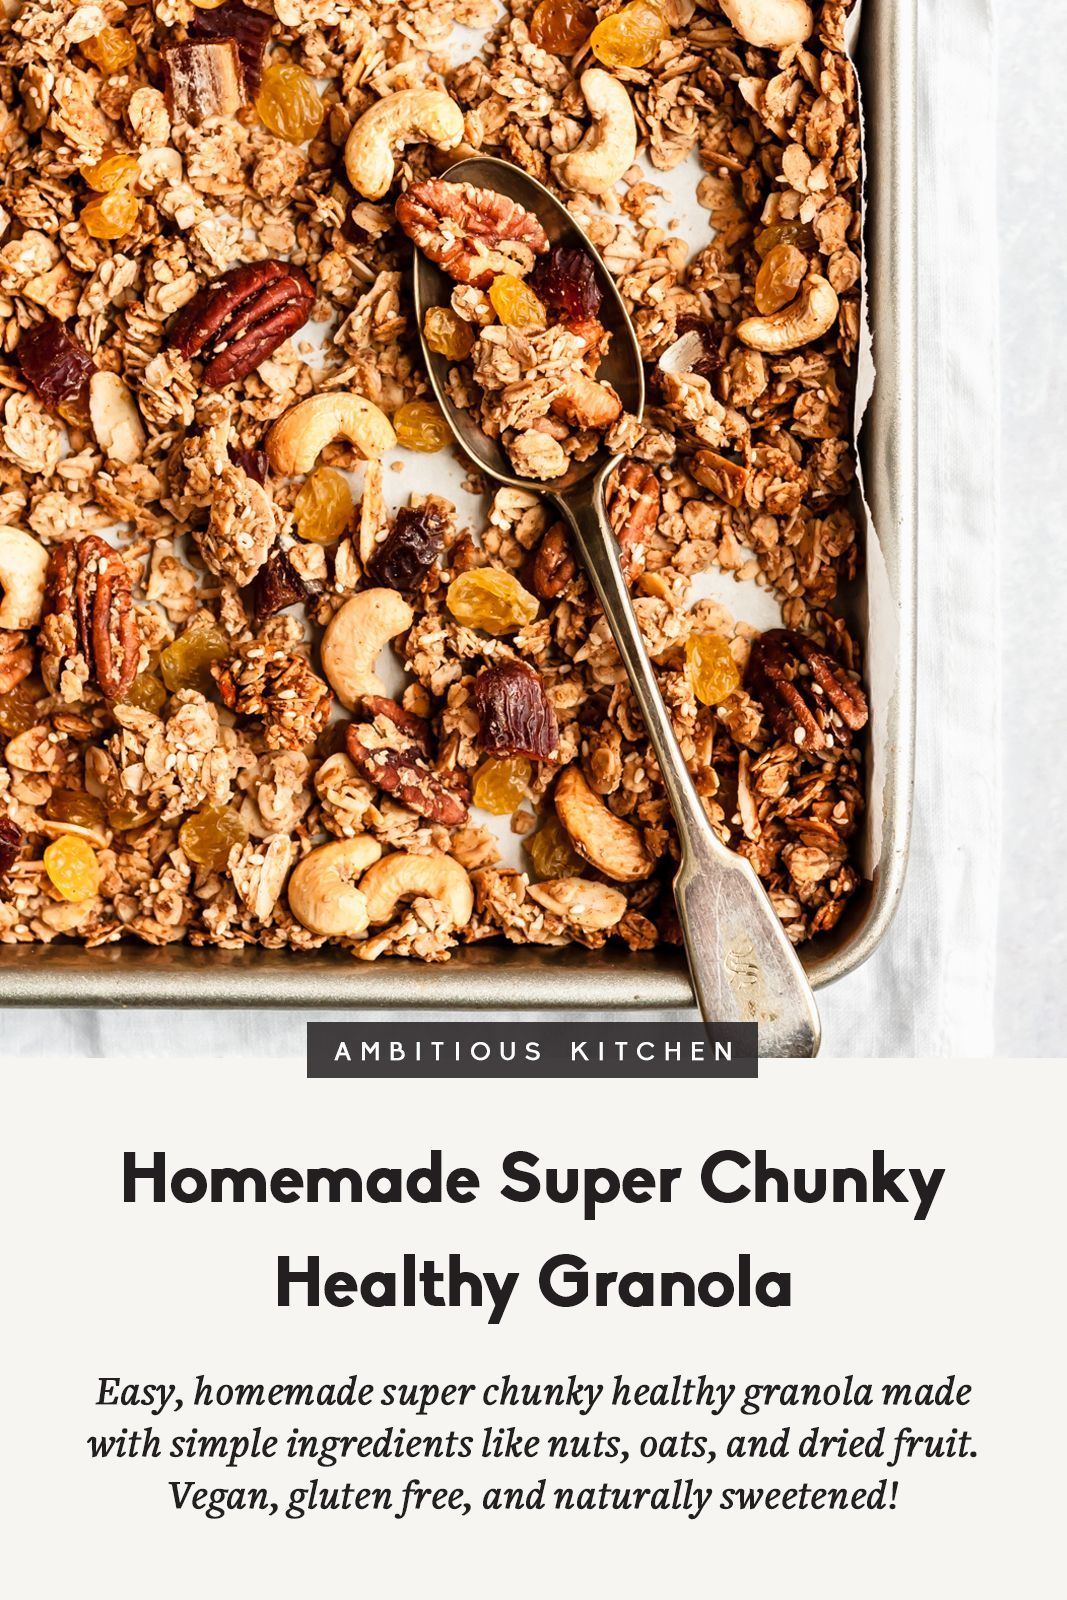 Wholesome Granola Recipe (vegan & gluten free!) | Bold Kitchen #flaxseedmealrecipes